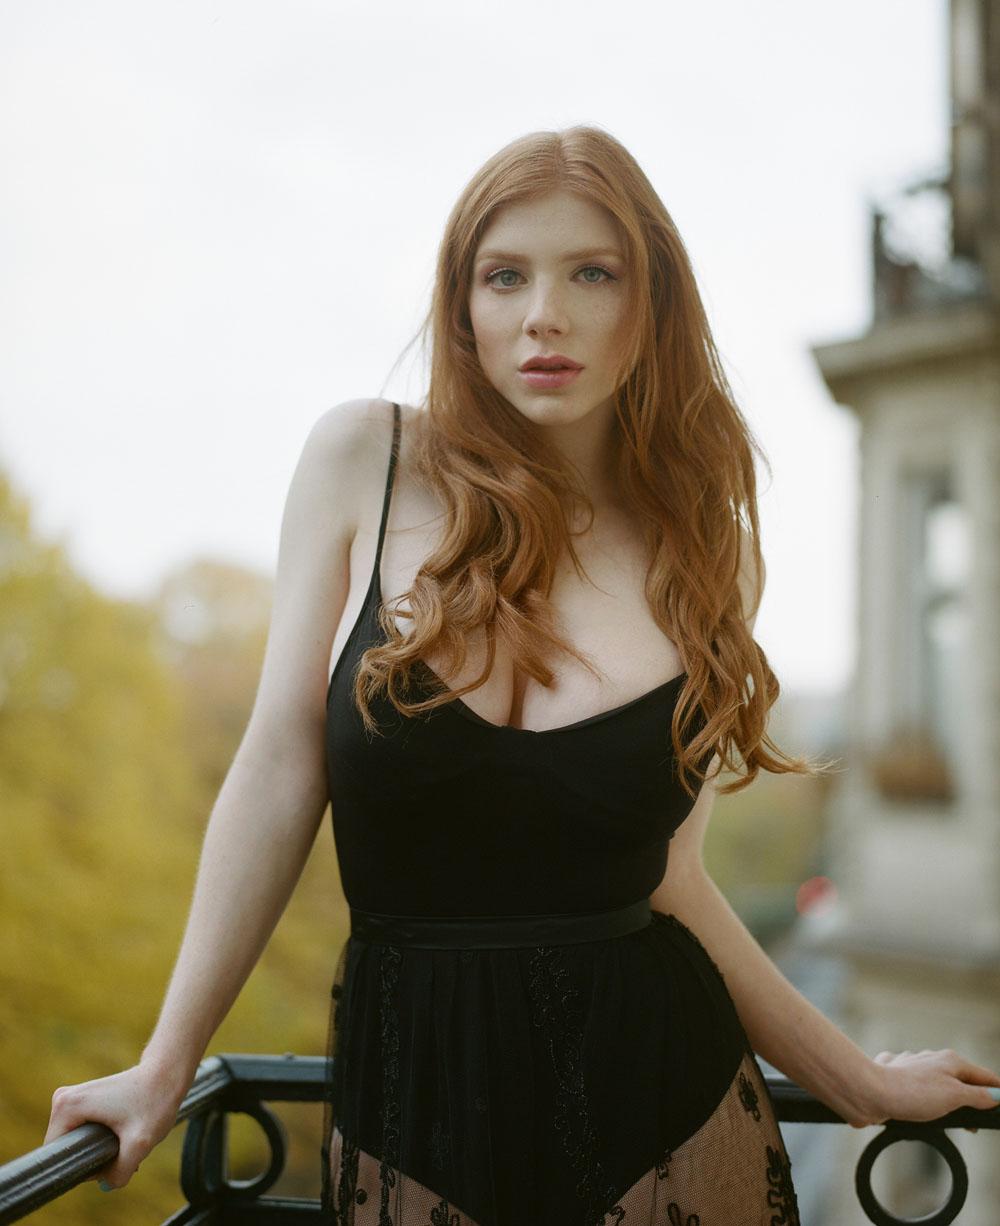 Isabelle-Engel-by-michaelta-borsky-c-heads-13.jpg